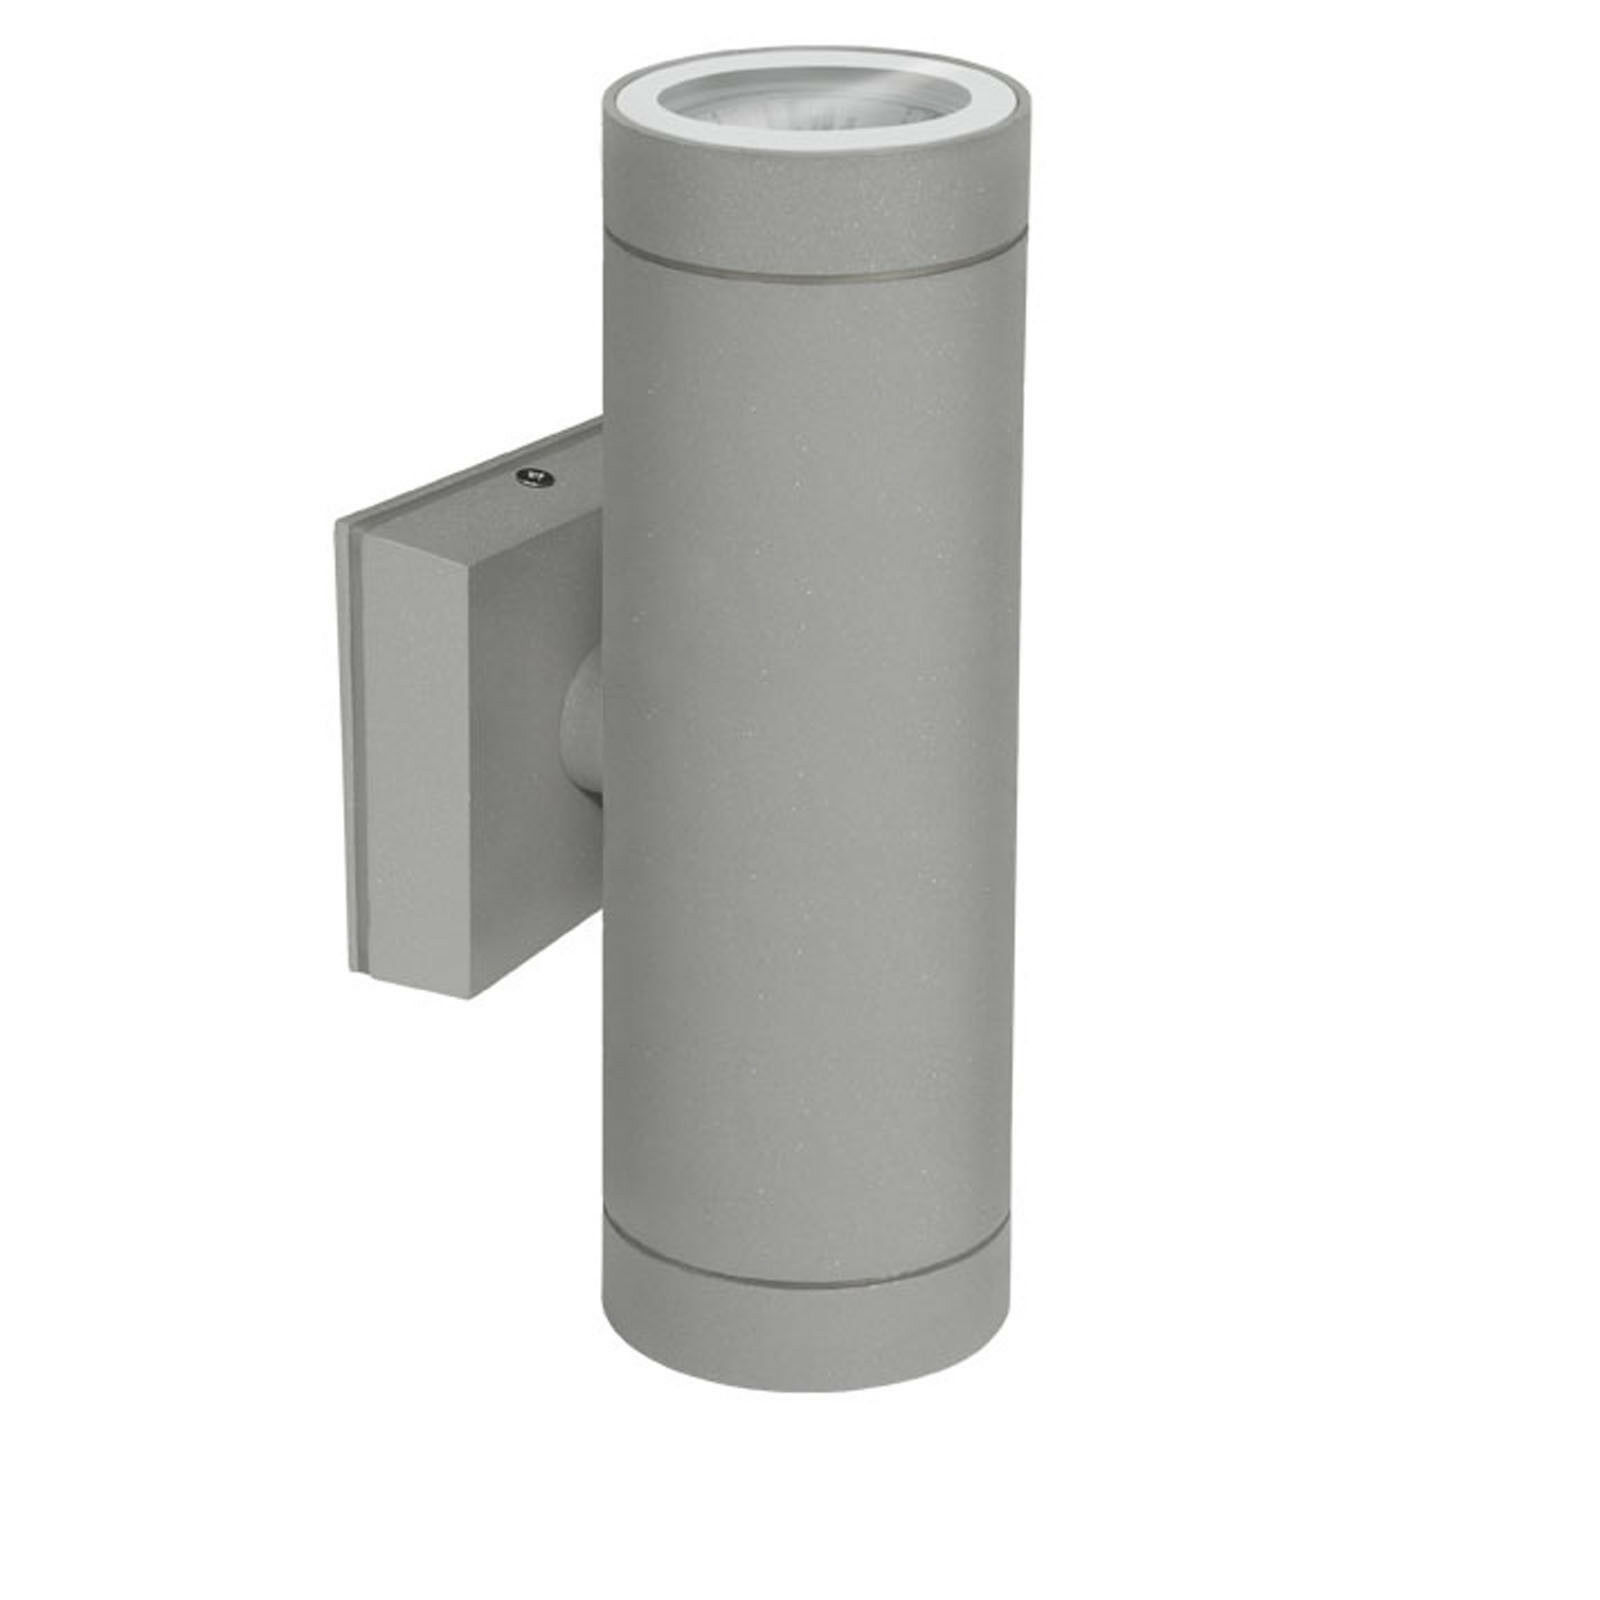 1-10er Sets Wandleuchte IP54 Grau mit LED 1-3W 230V Wand Lampe Leuchte BAL54